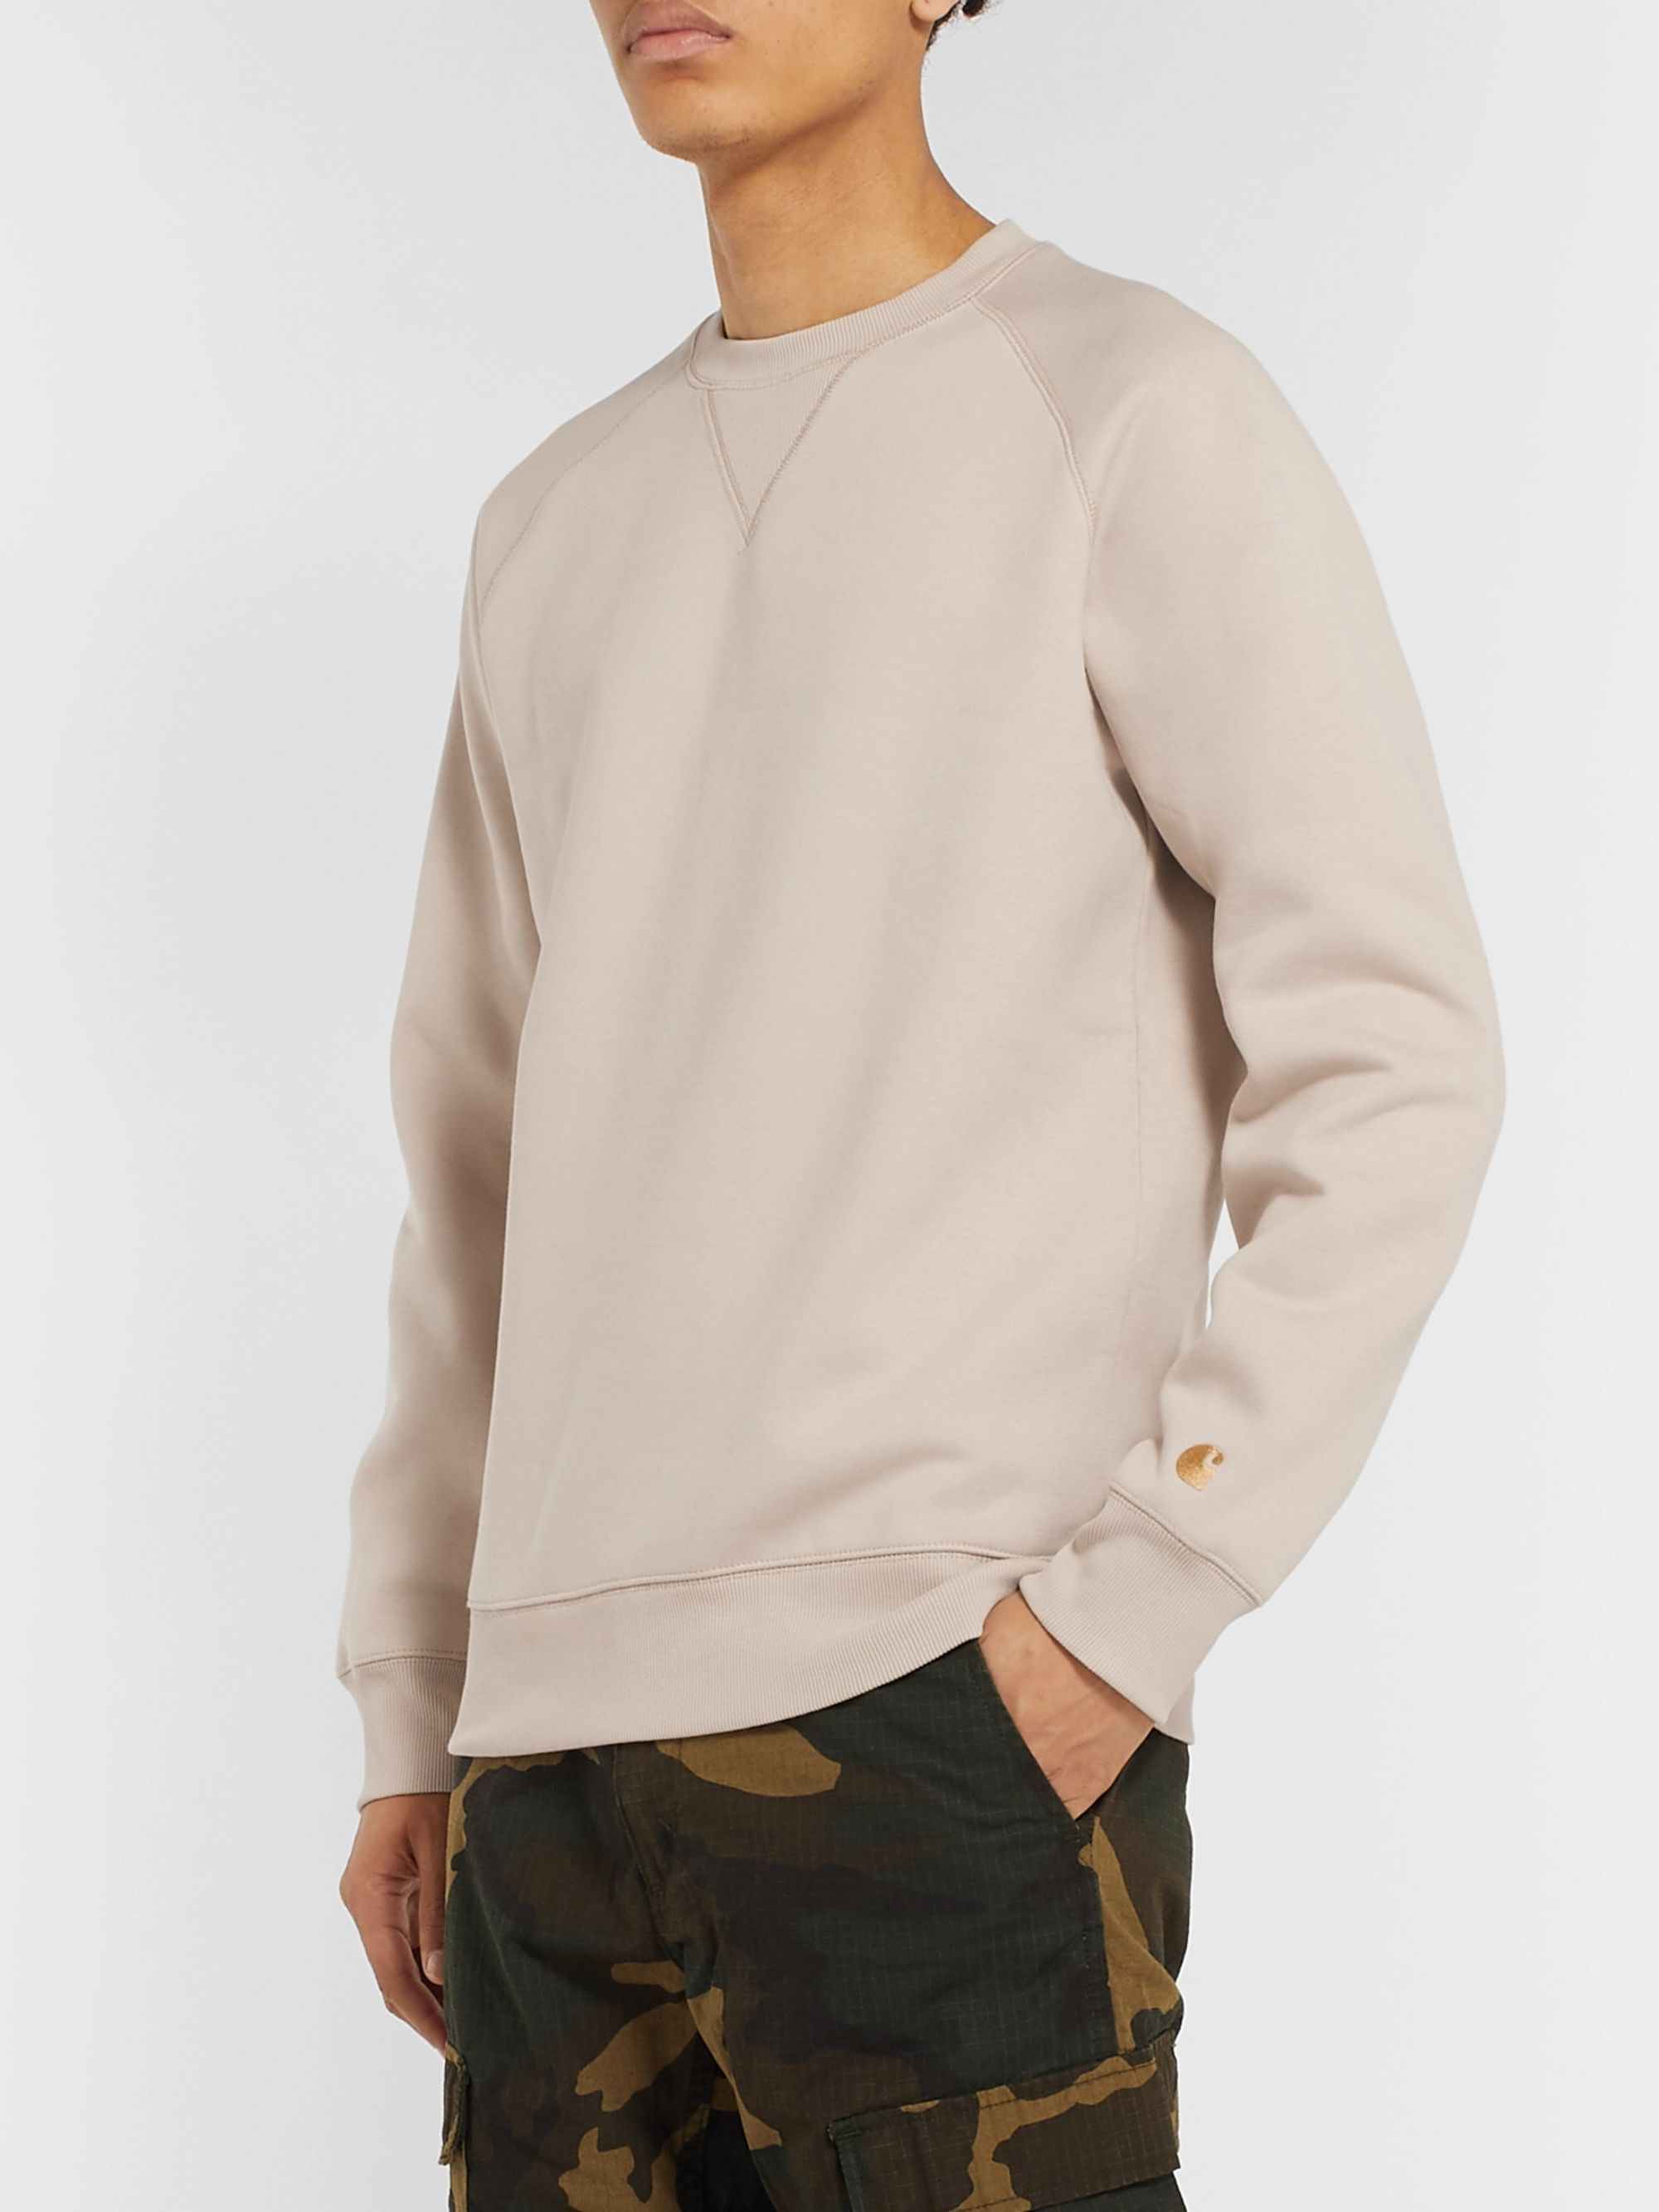 Chase Logo Embroidered Fleece Back Cotton Blend Jersey Sweatshirt